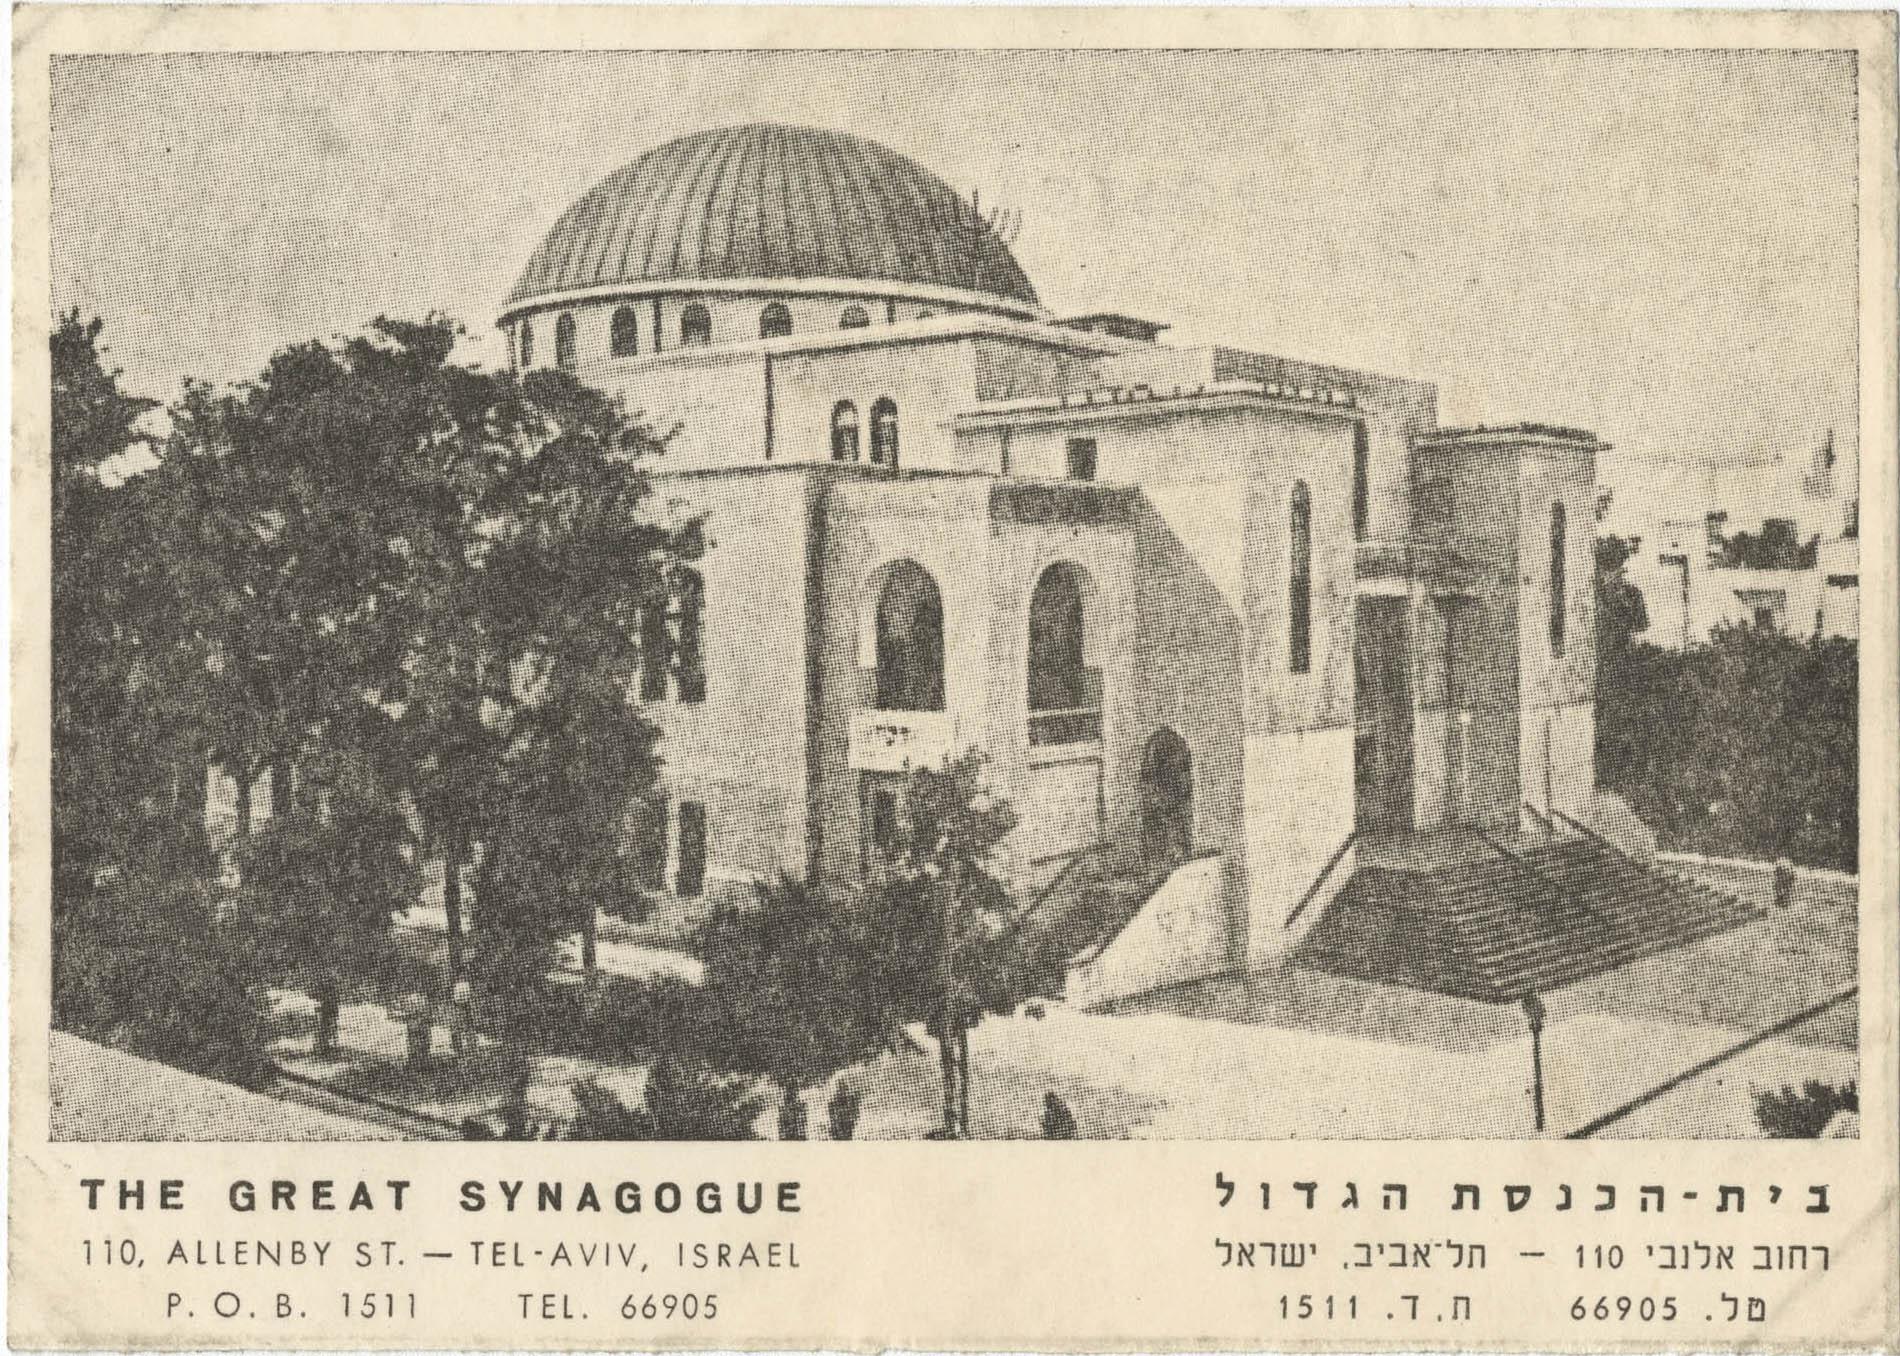 The Great Synagogue, 110 Allenby St. - Tel Aviv, Israel / בית הכנסת הגדול, רחוב אלנבי 110 - תל אביב, ישראל